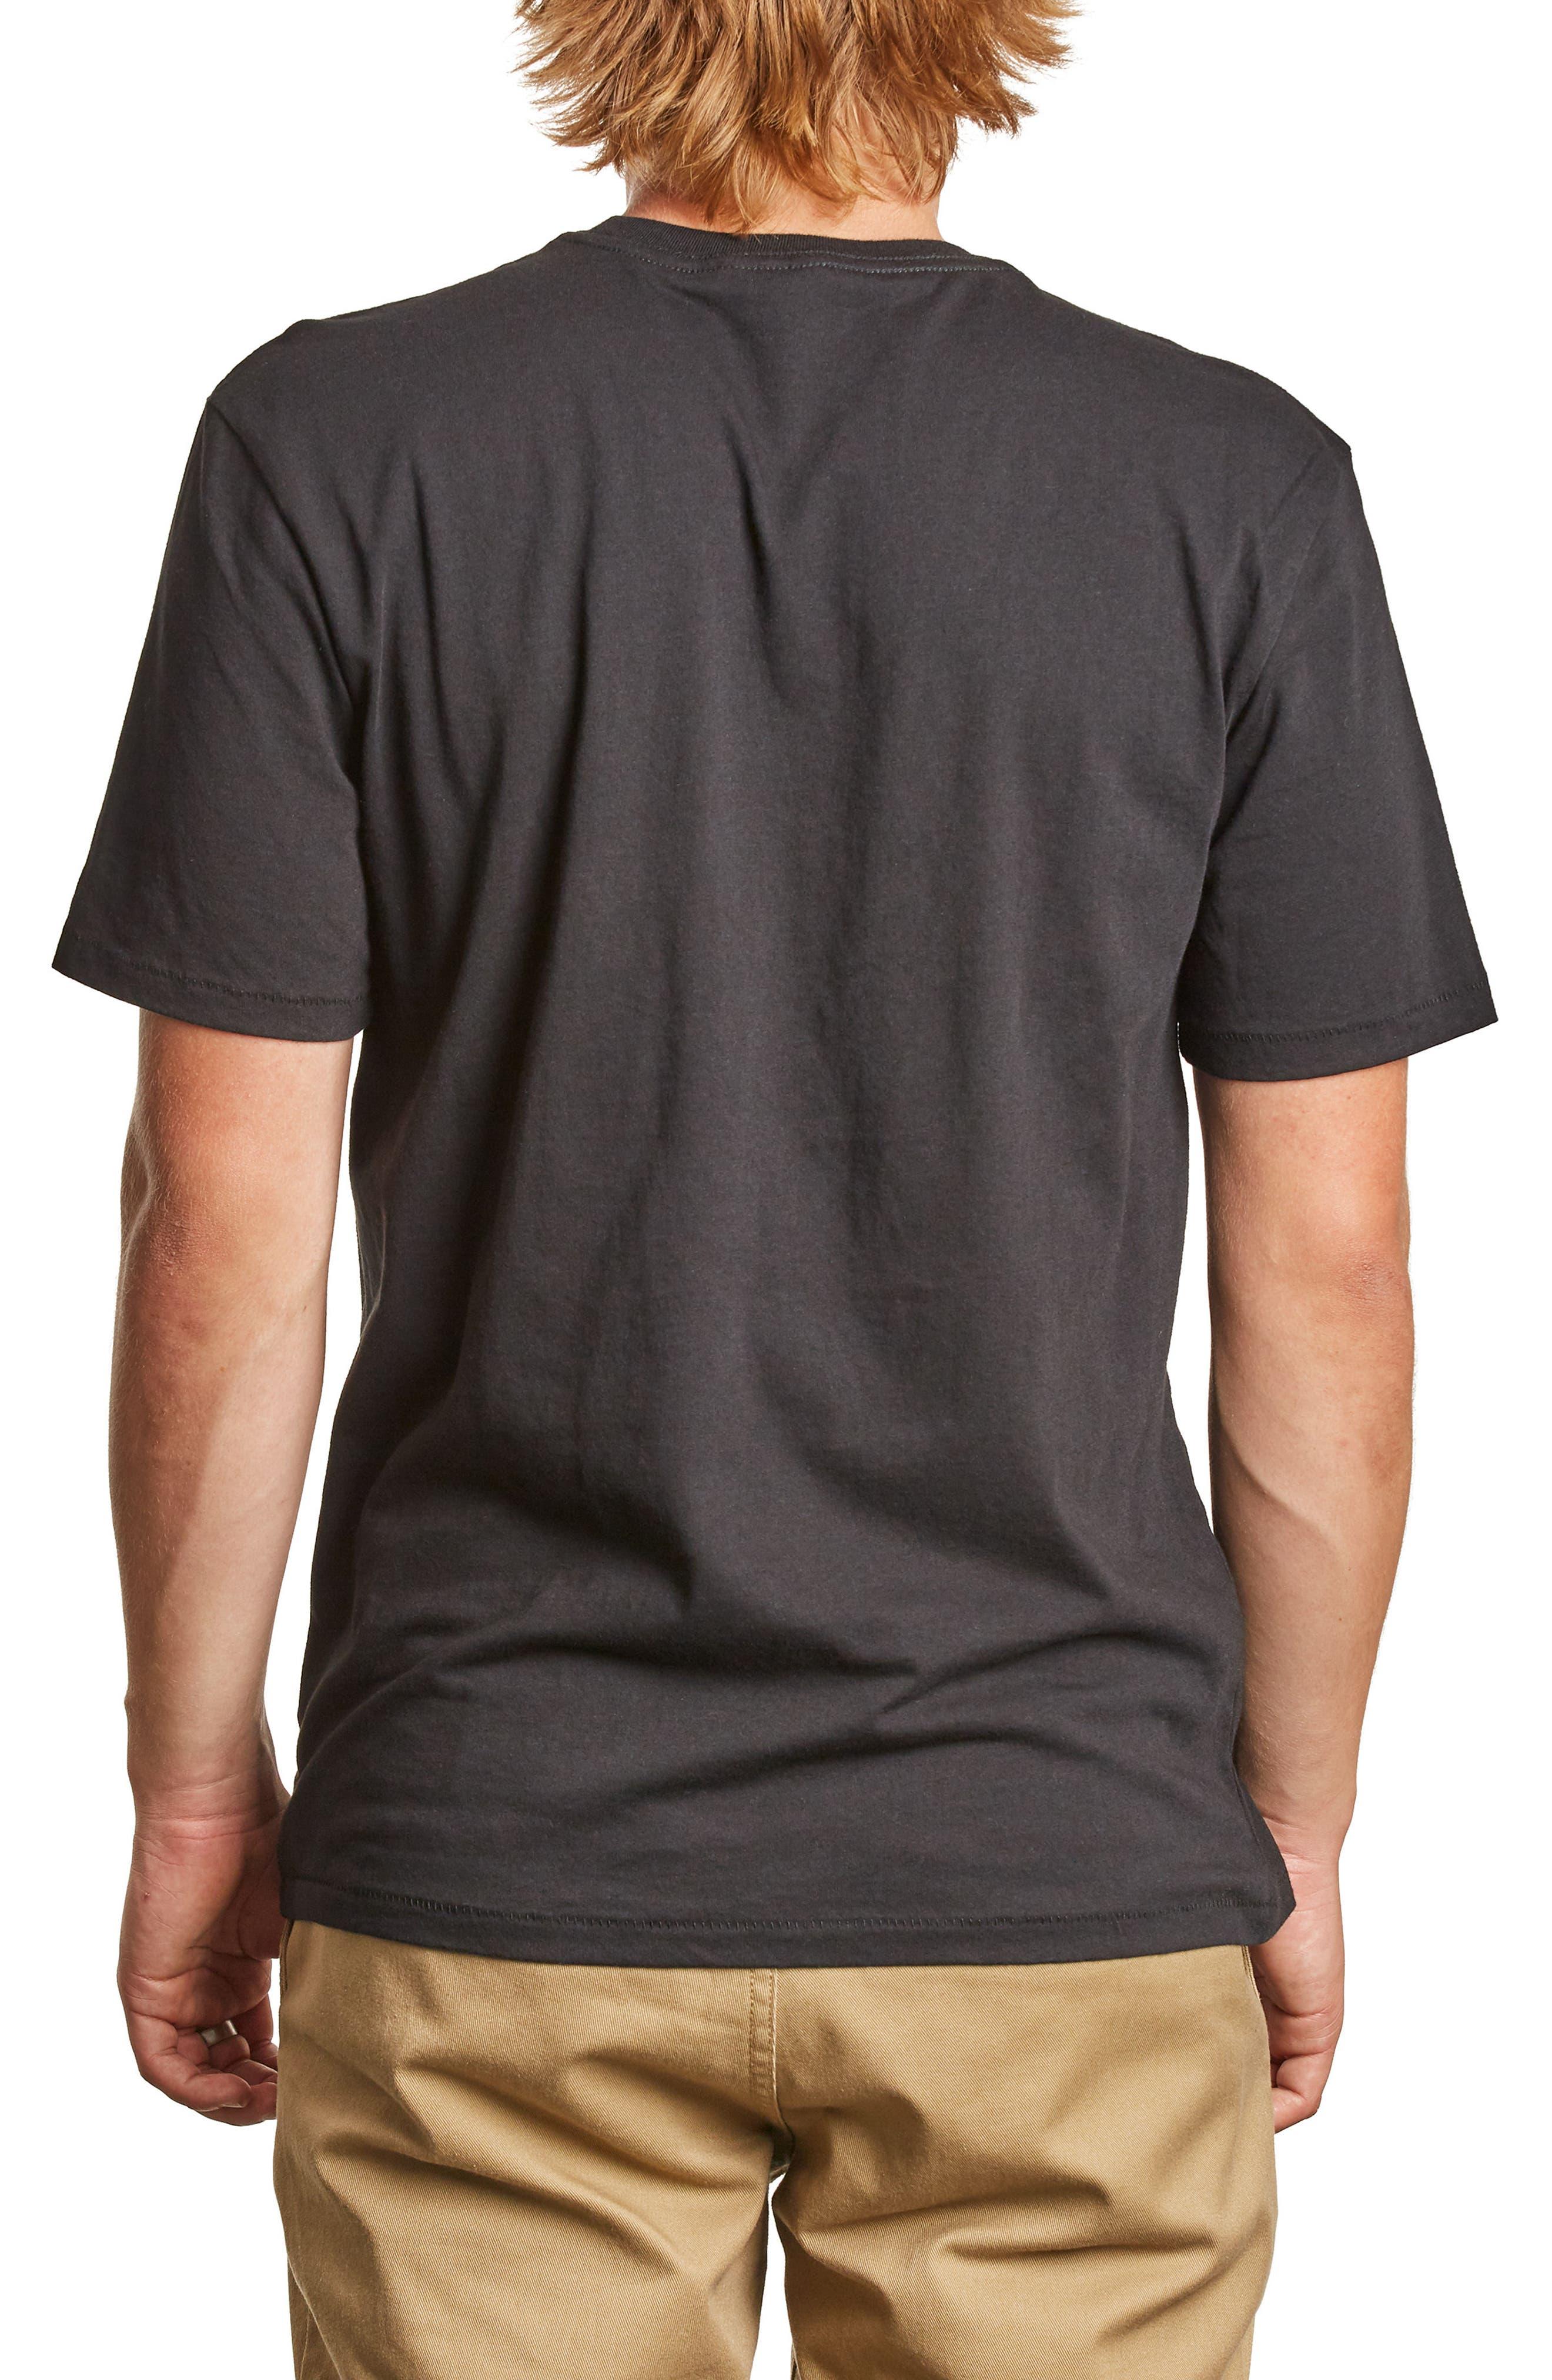 Dale II Premium T-Shirt,                             Alternate thumbnail 2, color,                             001